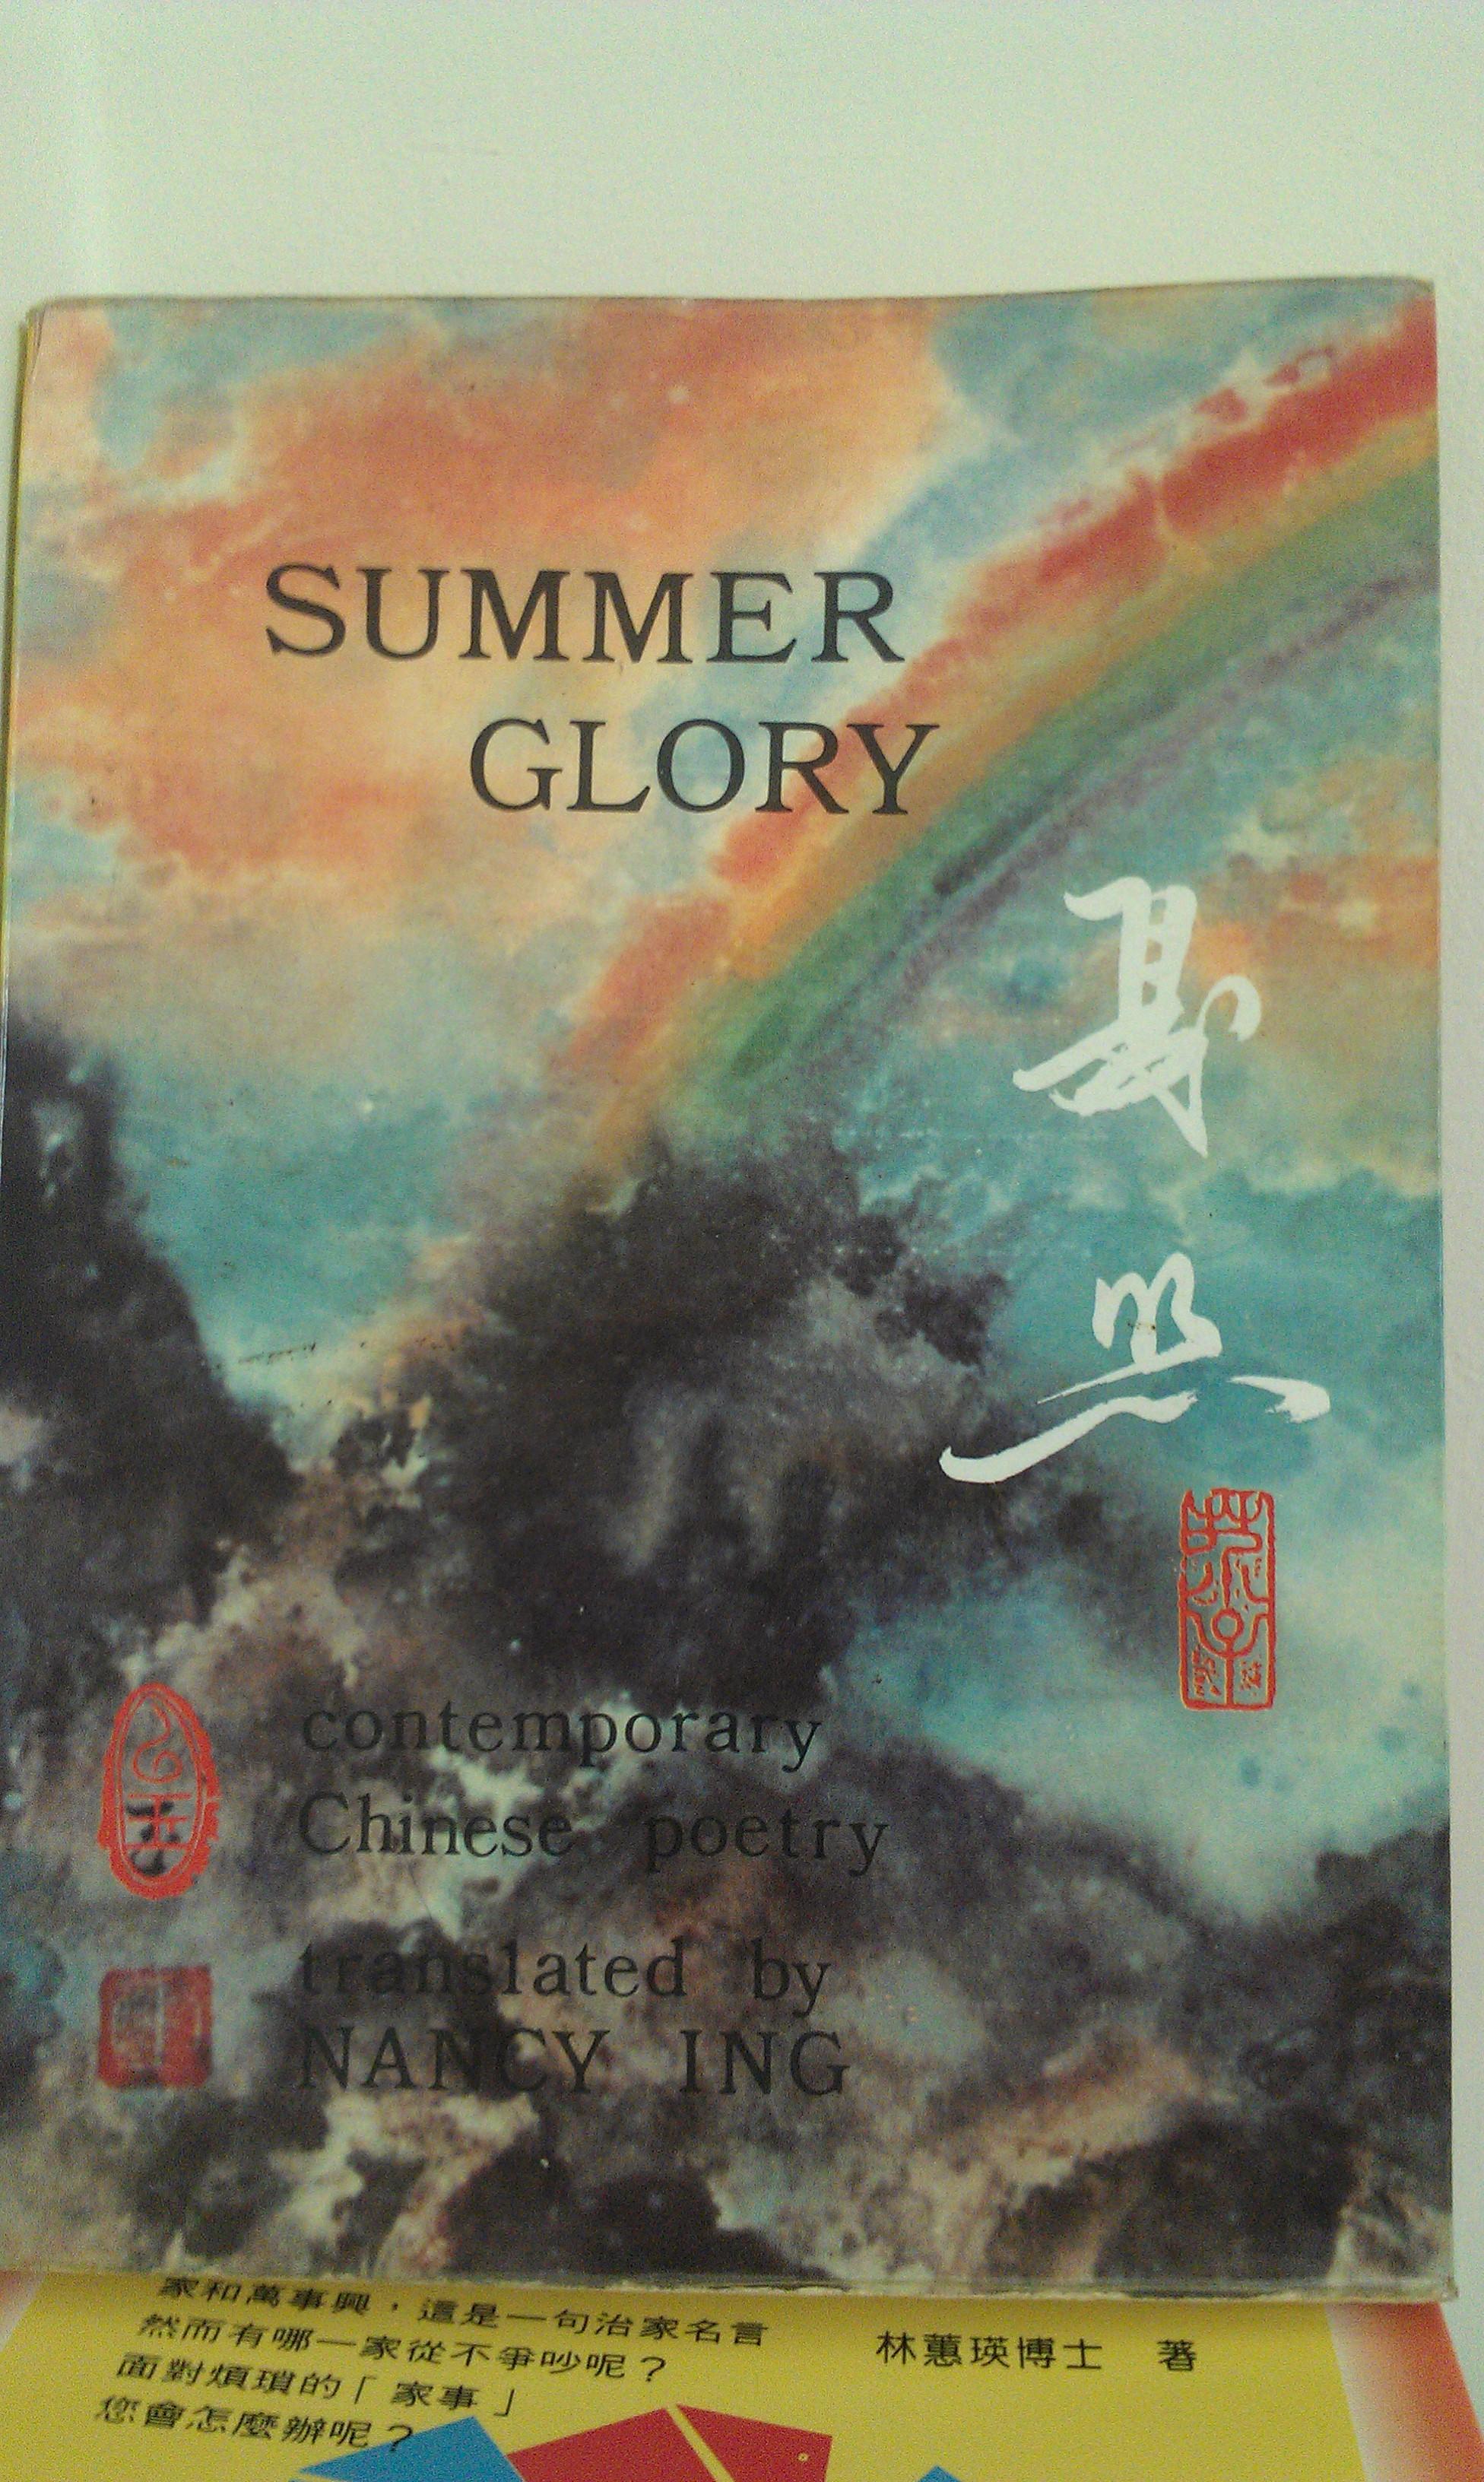 Summer glory